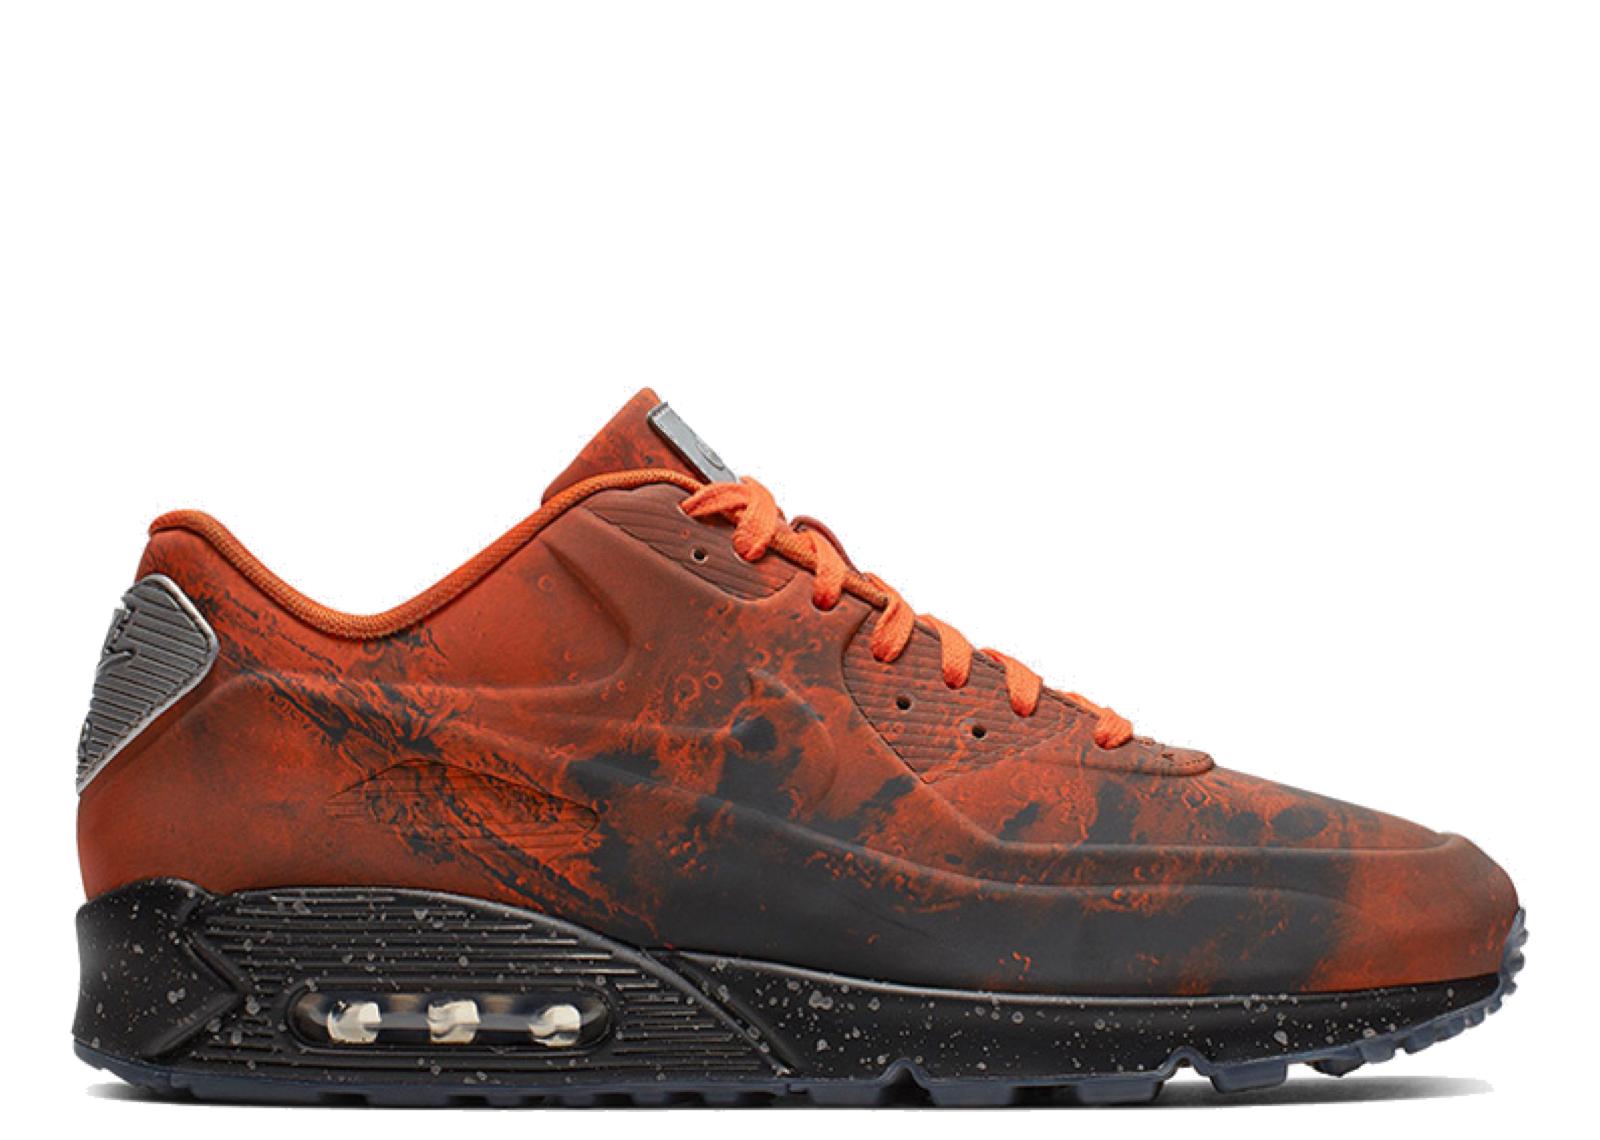 eea10d2532 Kick Avenue - Authentic Sneakers